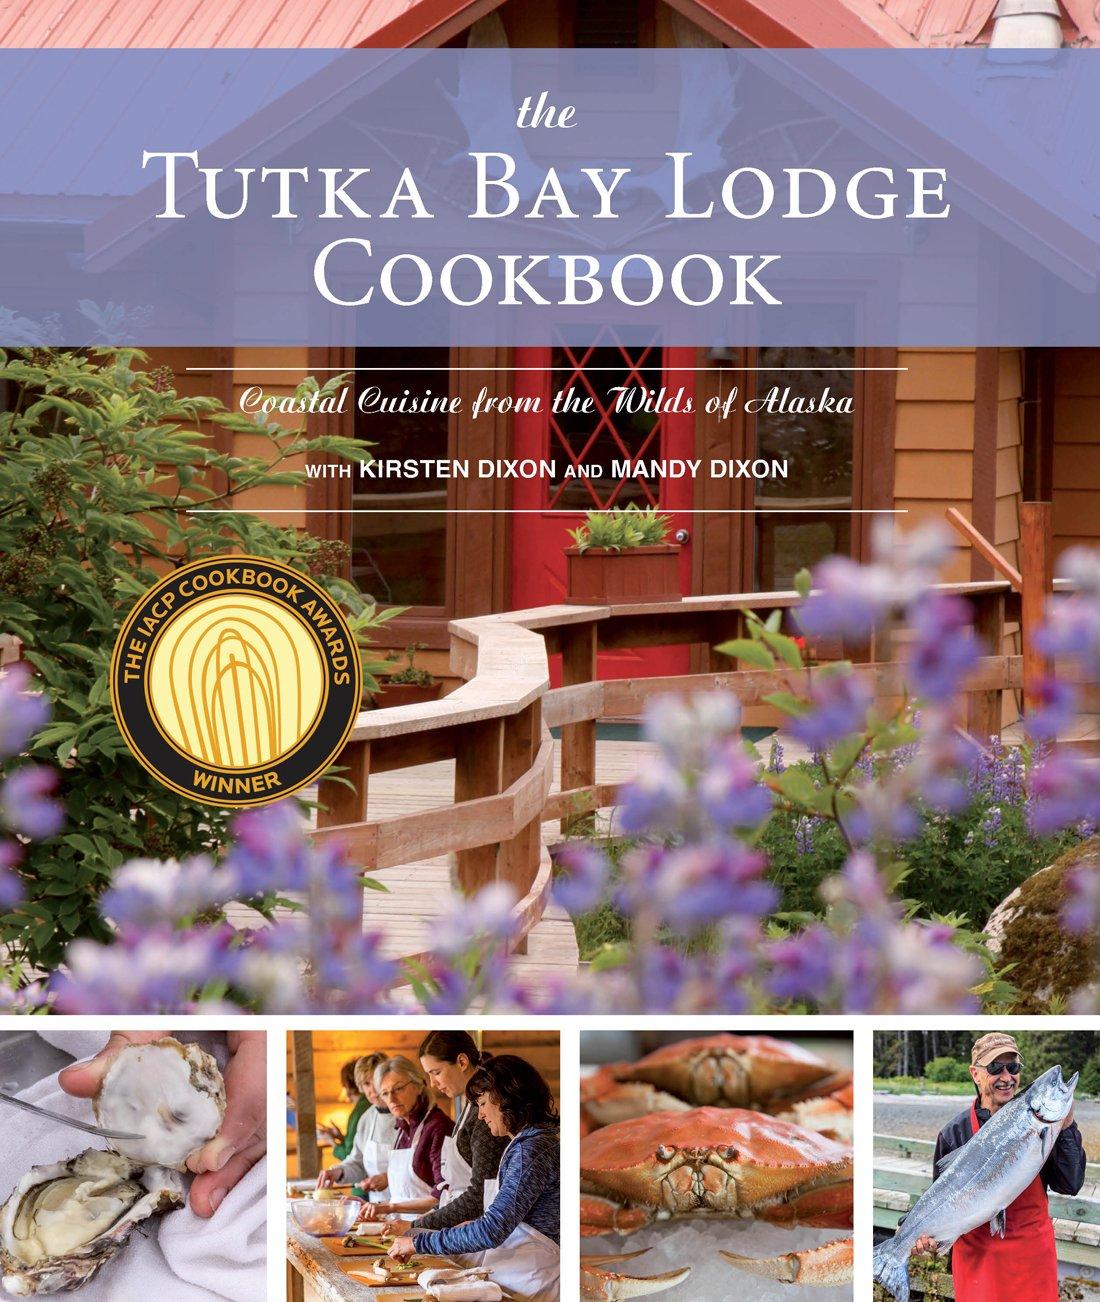 The Tutka Bay Lodge Cookbook: Coastal Cuisine from the Wilds of Alaska PDF